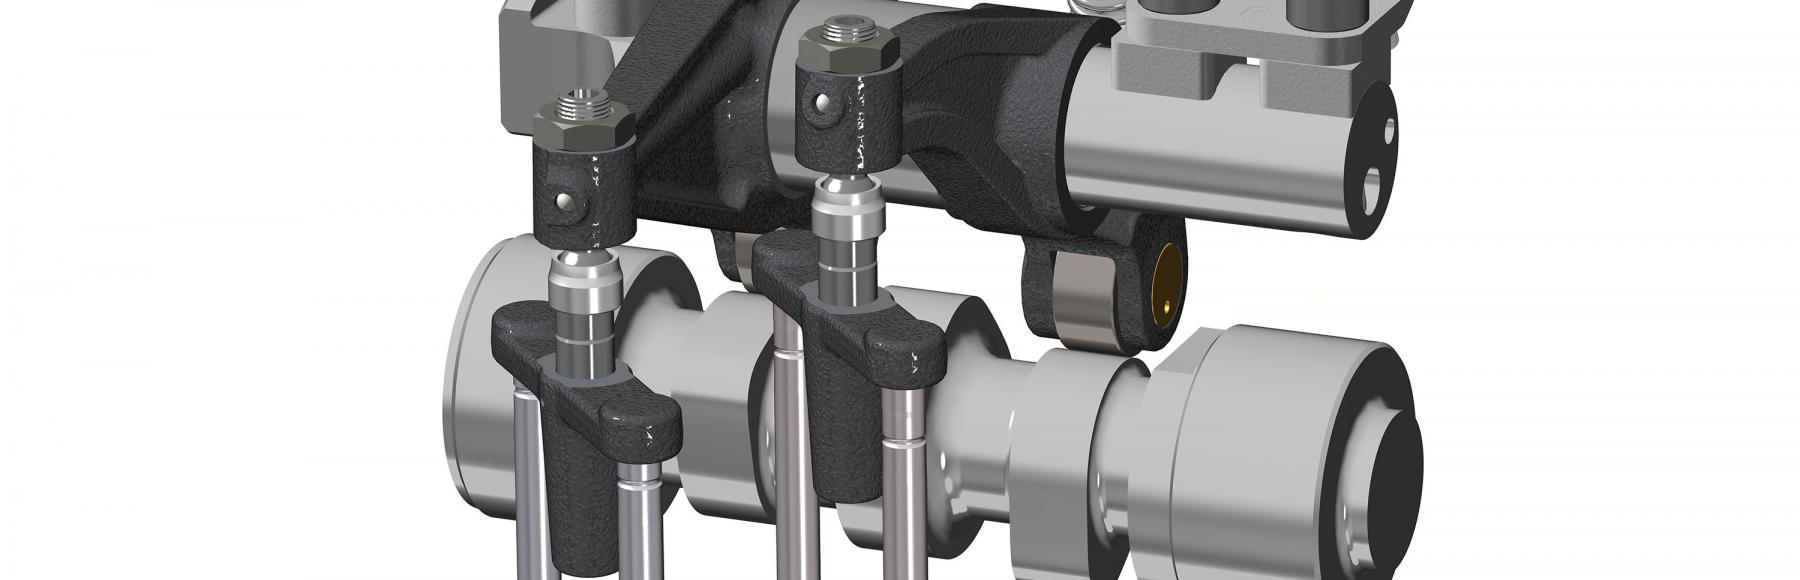 JVS的气缸停缸技术